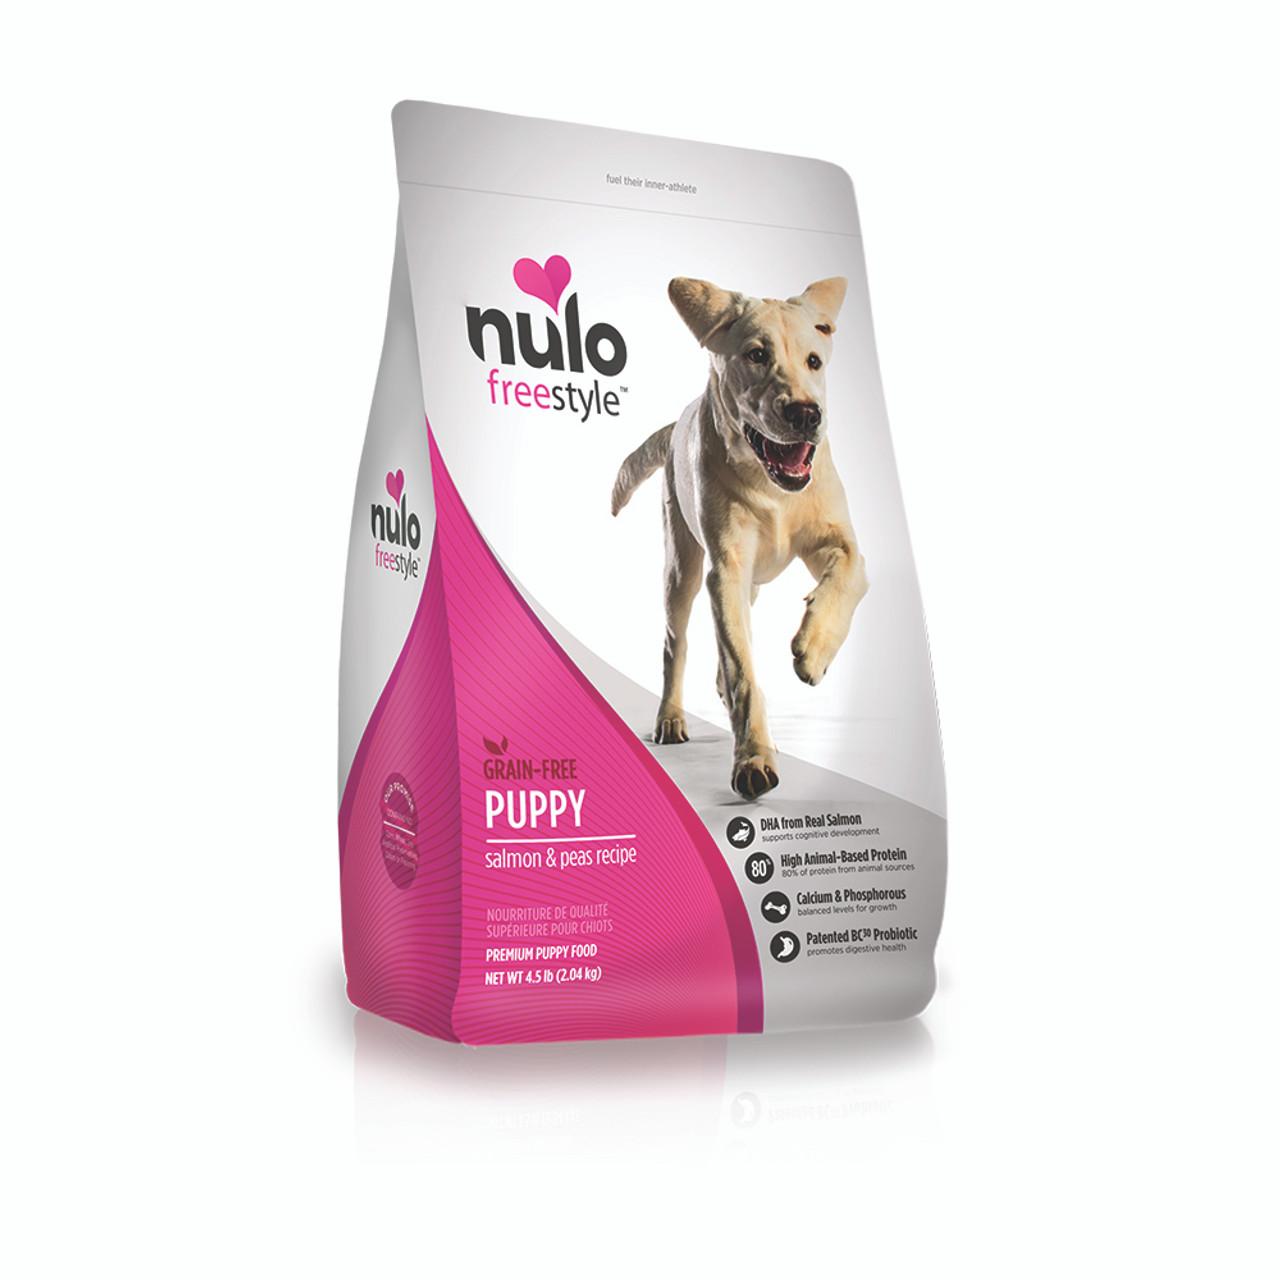 Nulo Freestyle Puppy Salmon & Peas Recipe Dry Dog Food